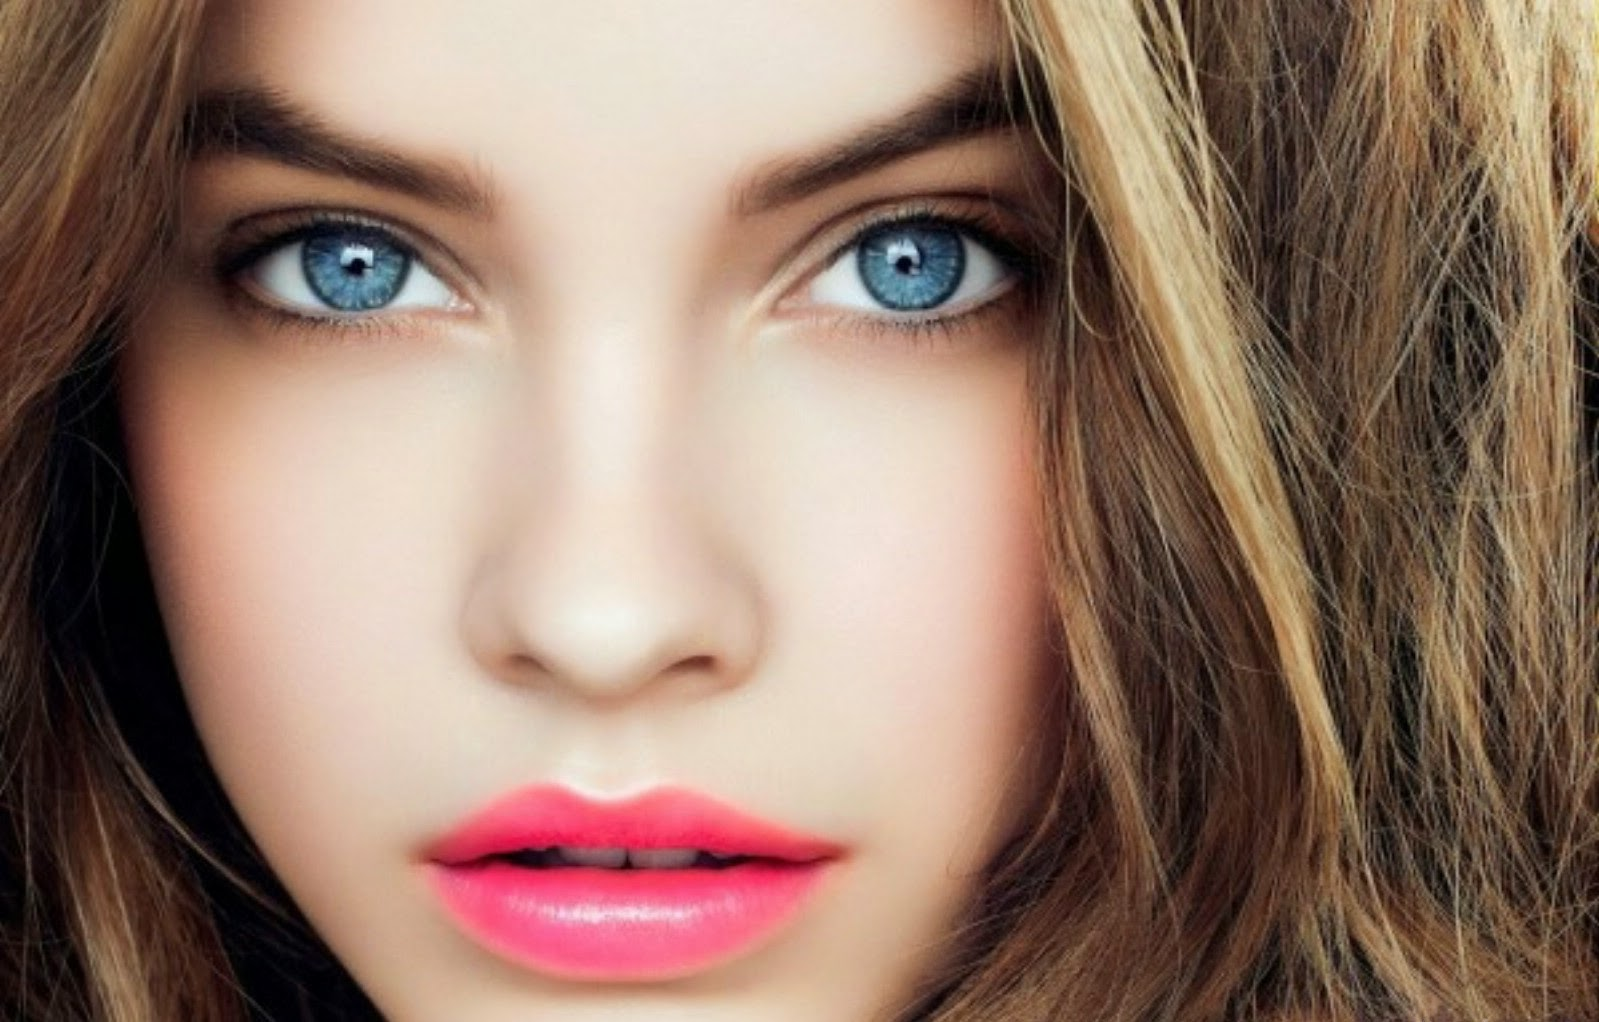 صور صور نساء جميلات , صور اجمل نساء العالم